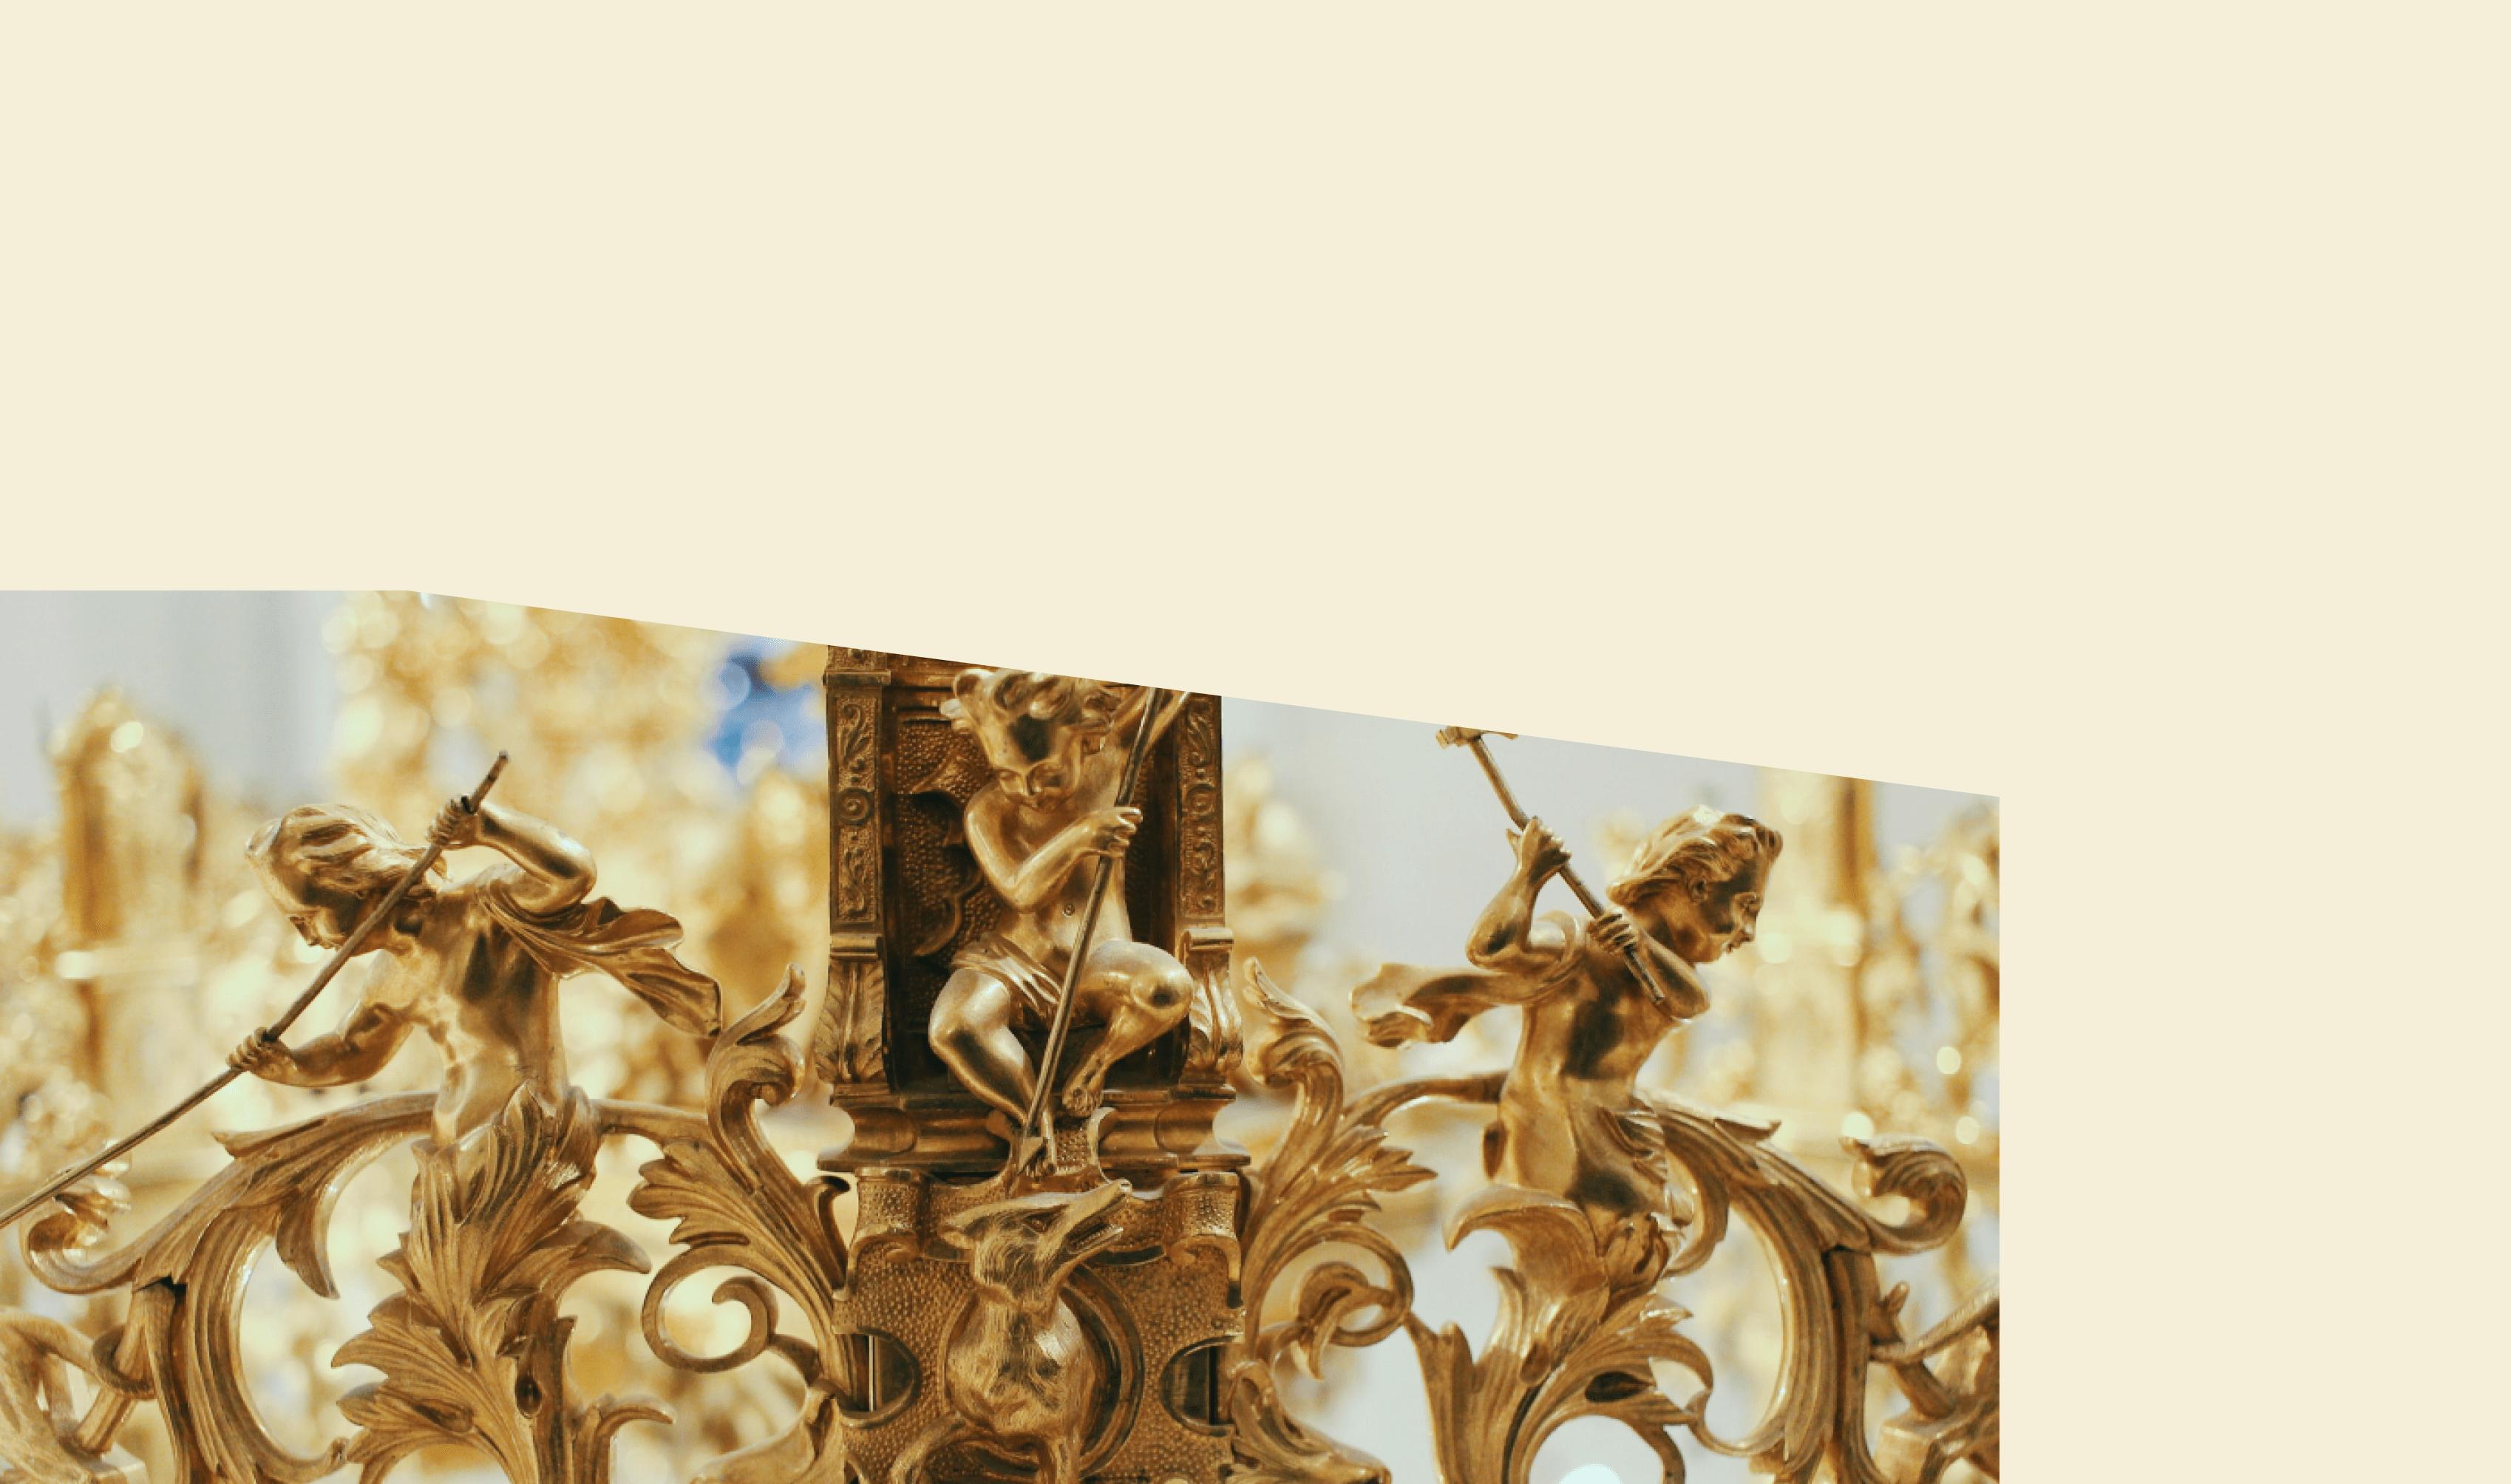 Gold.in.ua - Скупка золота и драгметаллов. Декоративное изображение